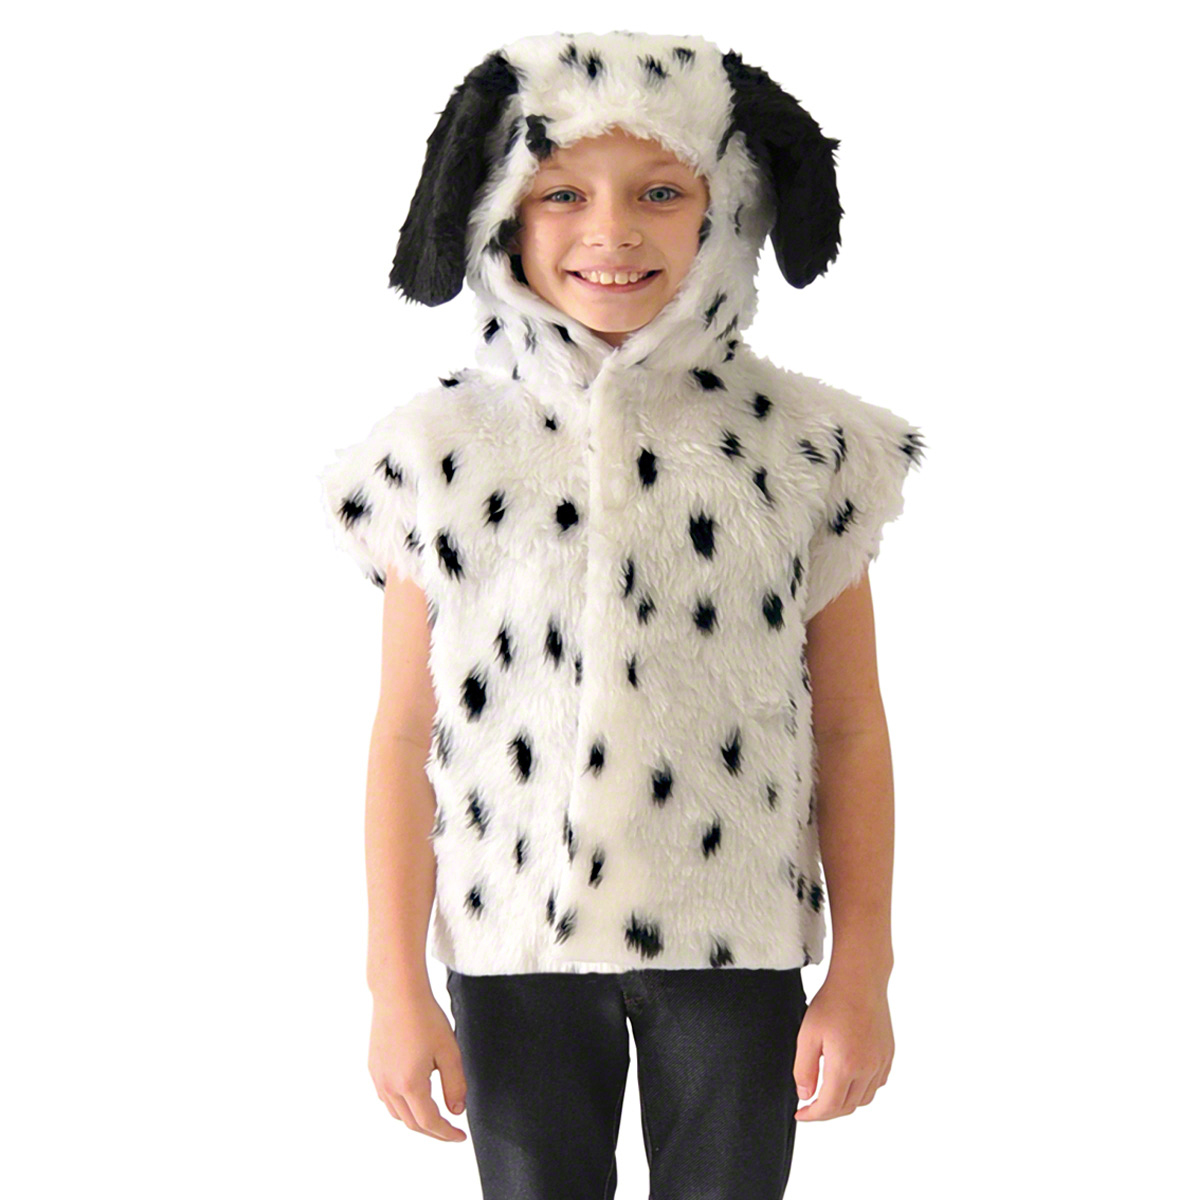 kinder dalmatiner hund sch rze kost m 101 dalmatiner alter 3 9 jahre ebay. Black Bedroom Furniture Sets. Home Design Ideas